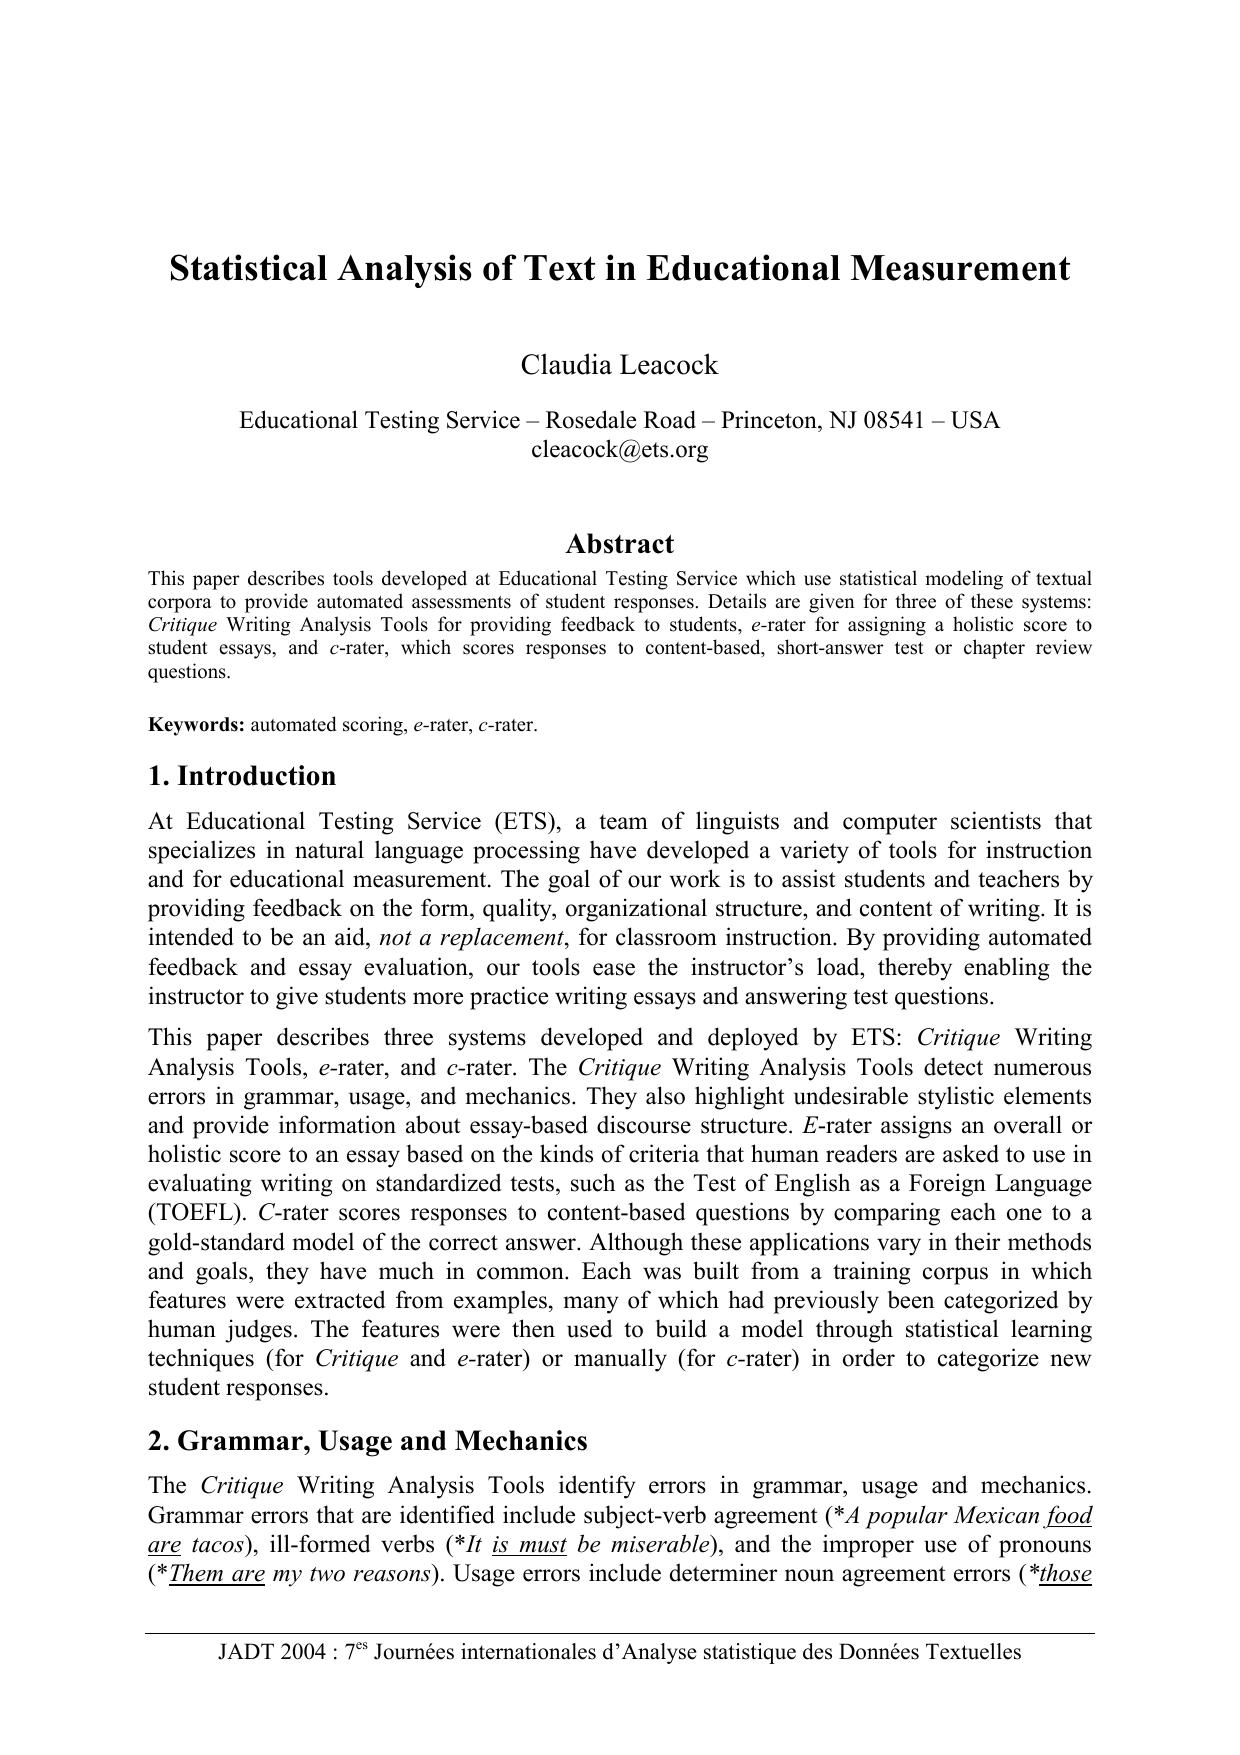 critical review pdf